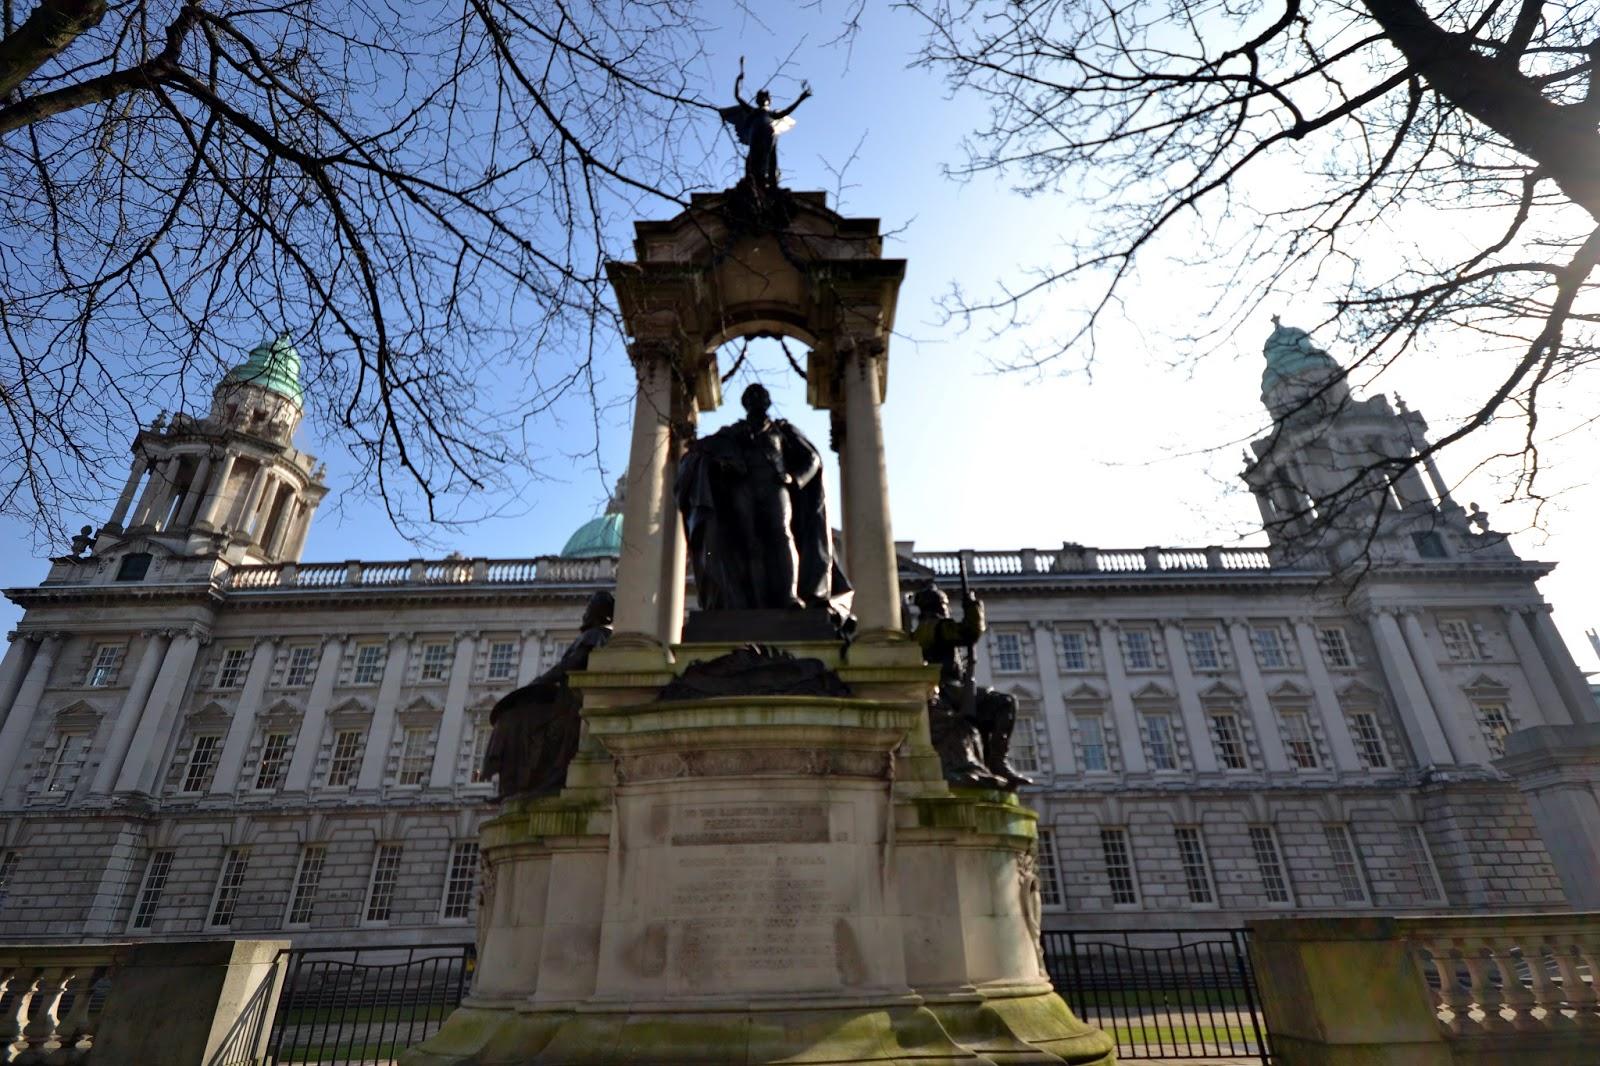 City hall, Belfast, Ireland, Northern Ireland, Murals, Troubles, Ulster, Political, Titanic,